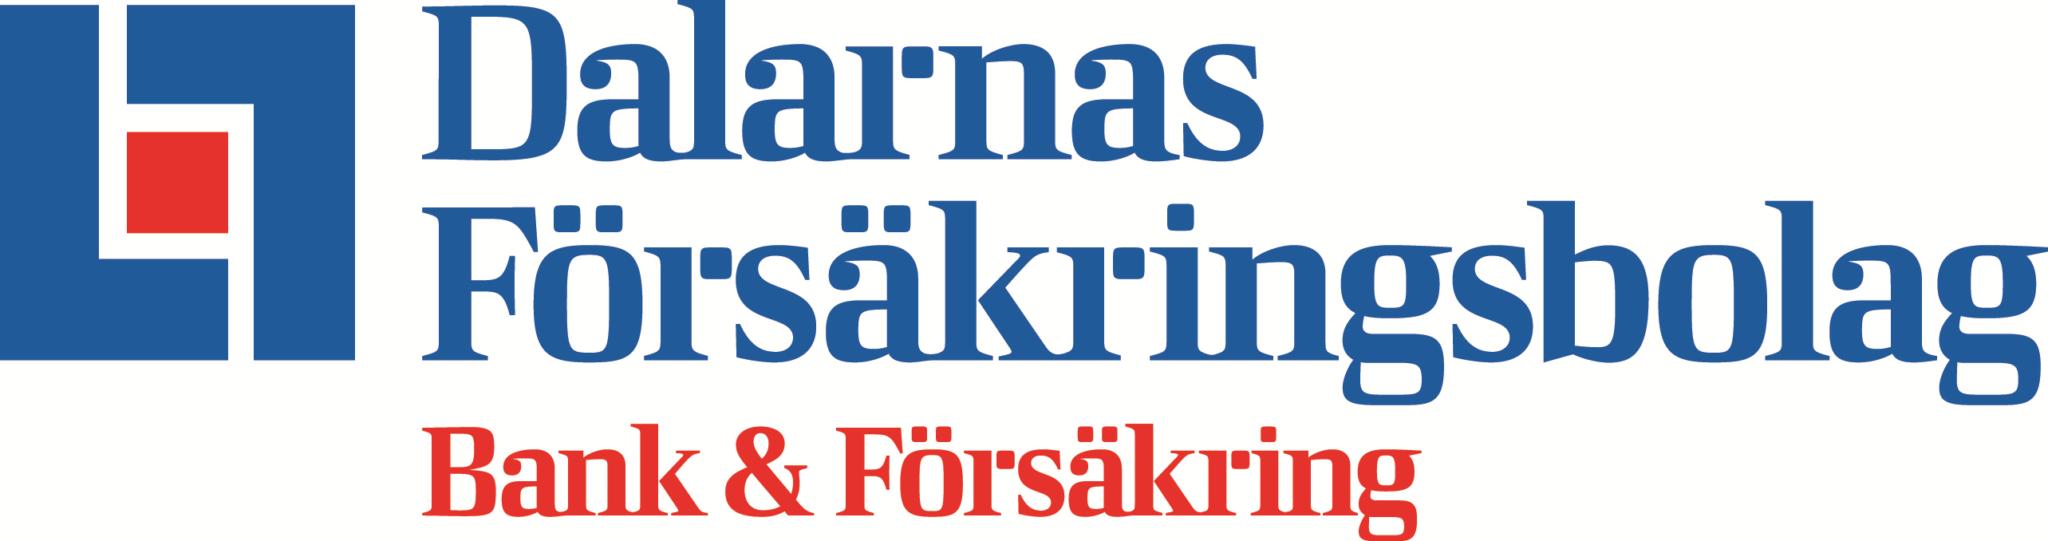 DalarnaForsakring